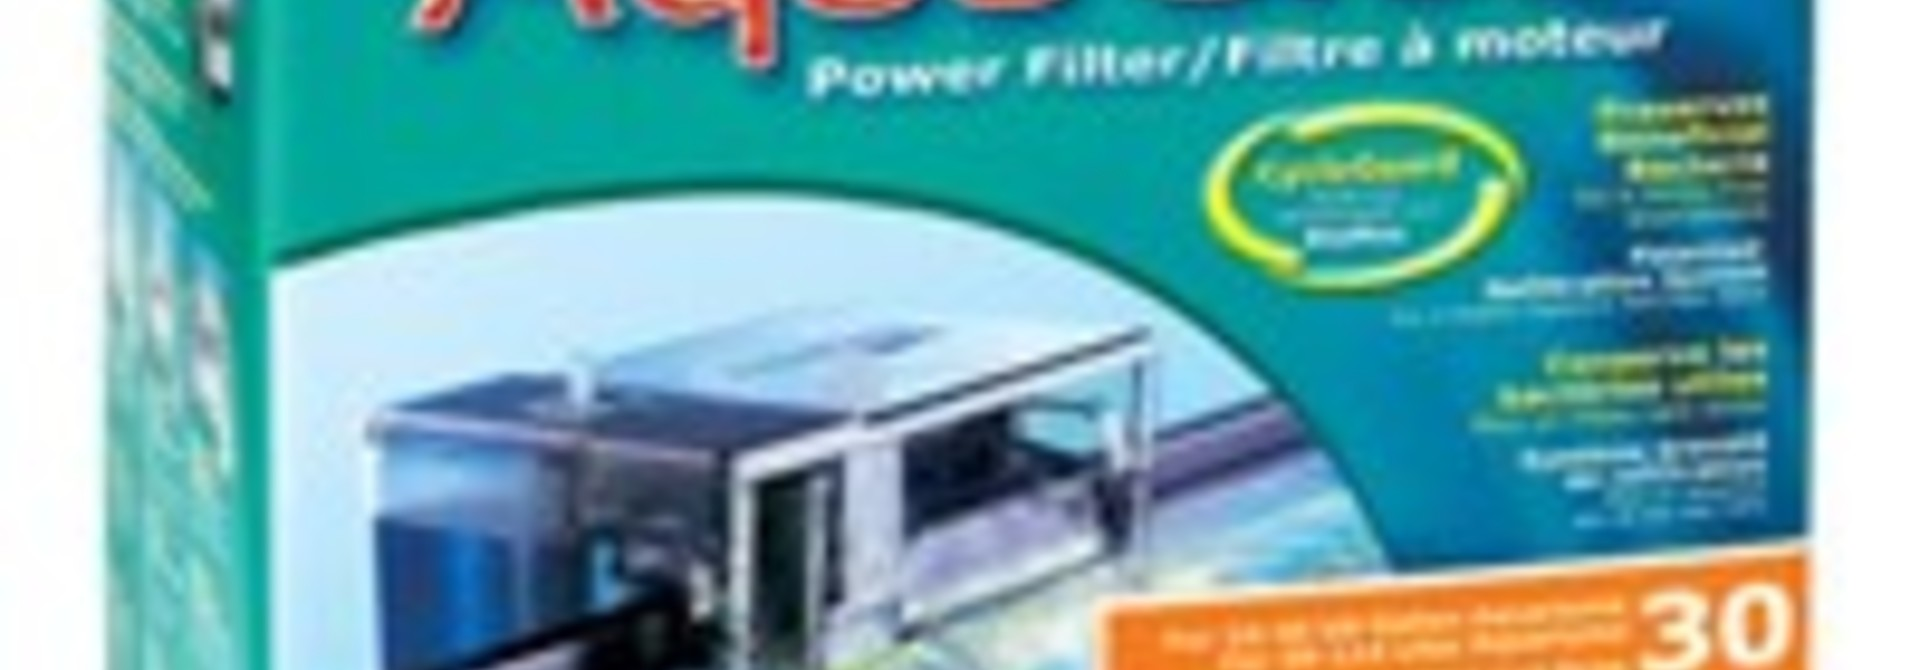 AquaClear 30 Power Filter, 114 L (30 US Gal.)